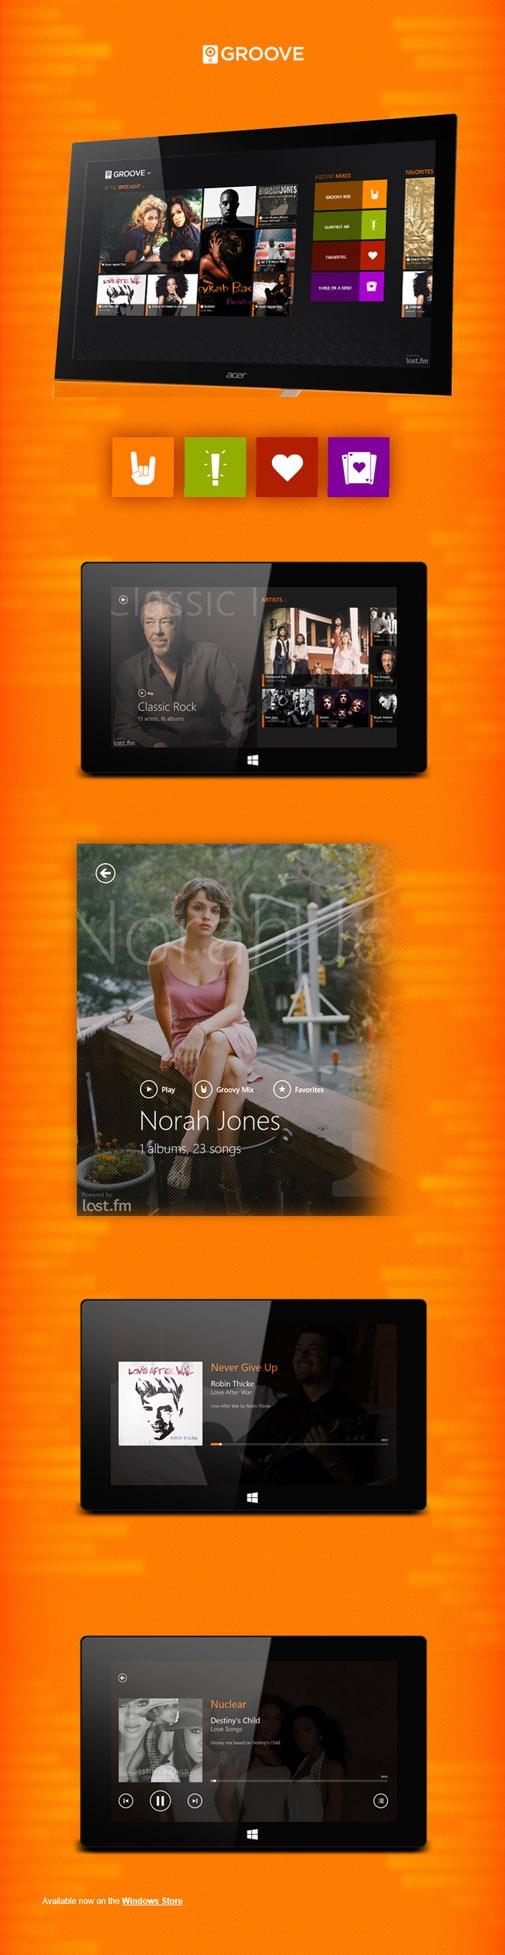 Design poster win8 - Groove App Windows 8 Metro Ui Design Smart Music App